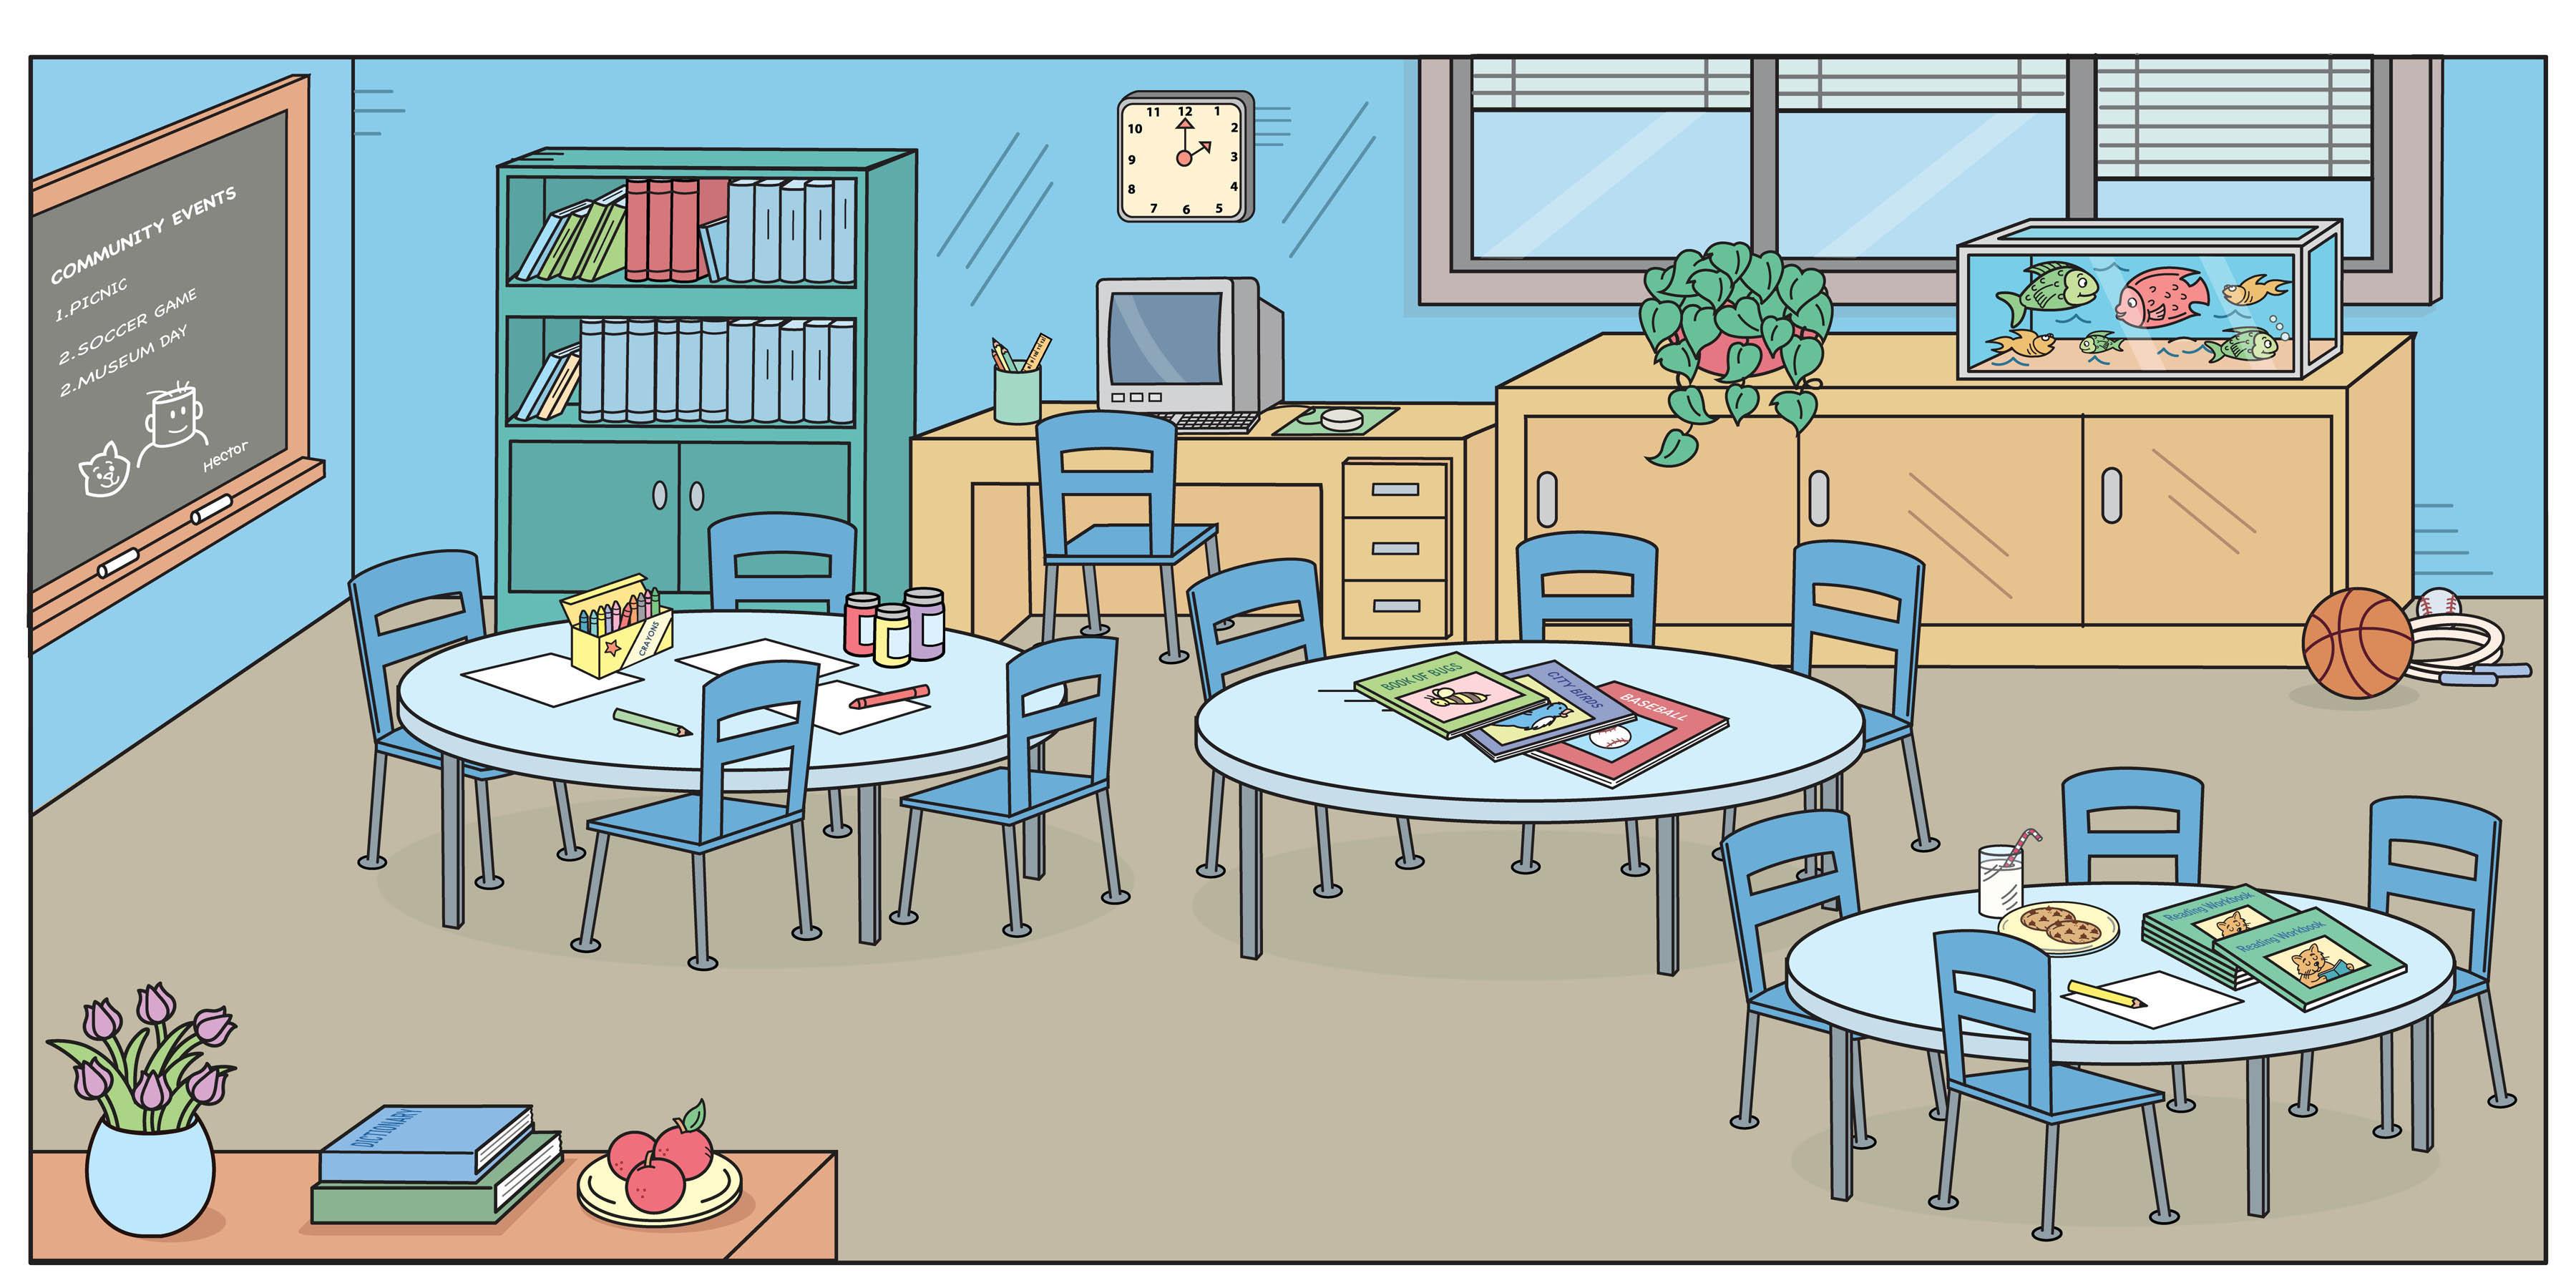 Classroom Clipart Kids - Cliparts.co: cliparts.co/classroom-clipart-kids